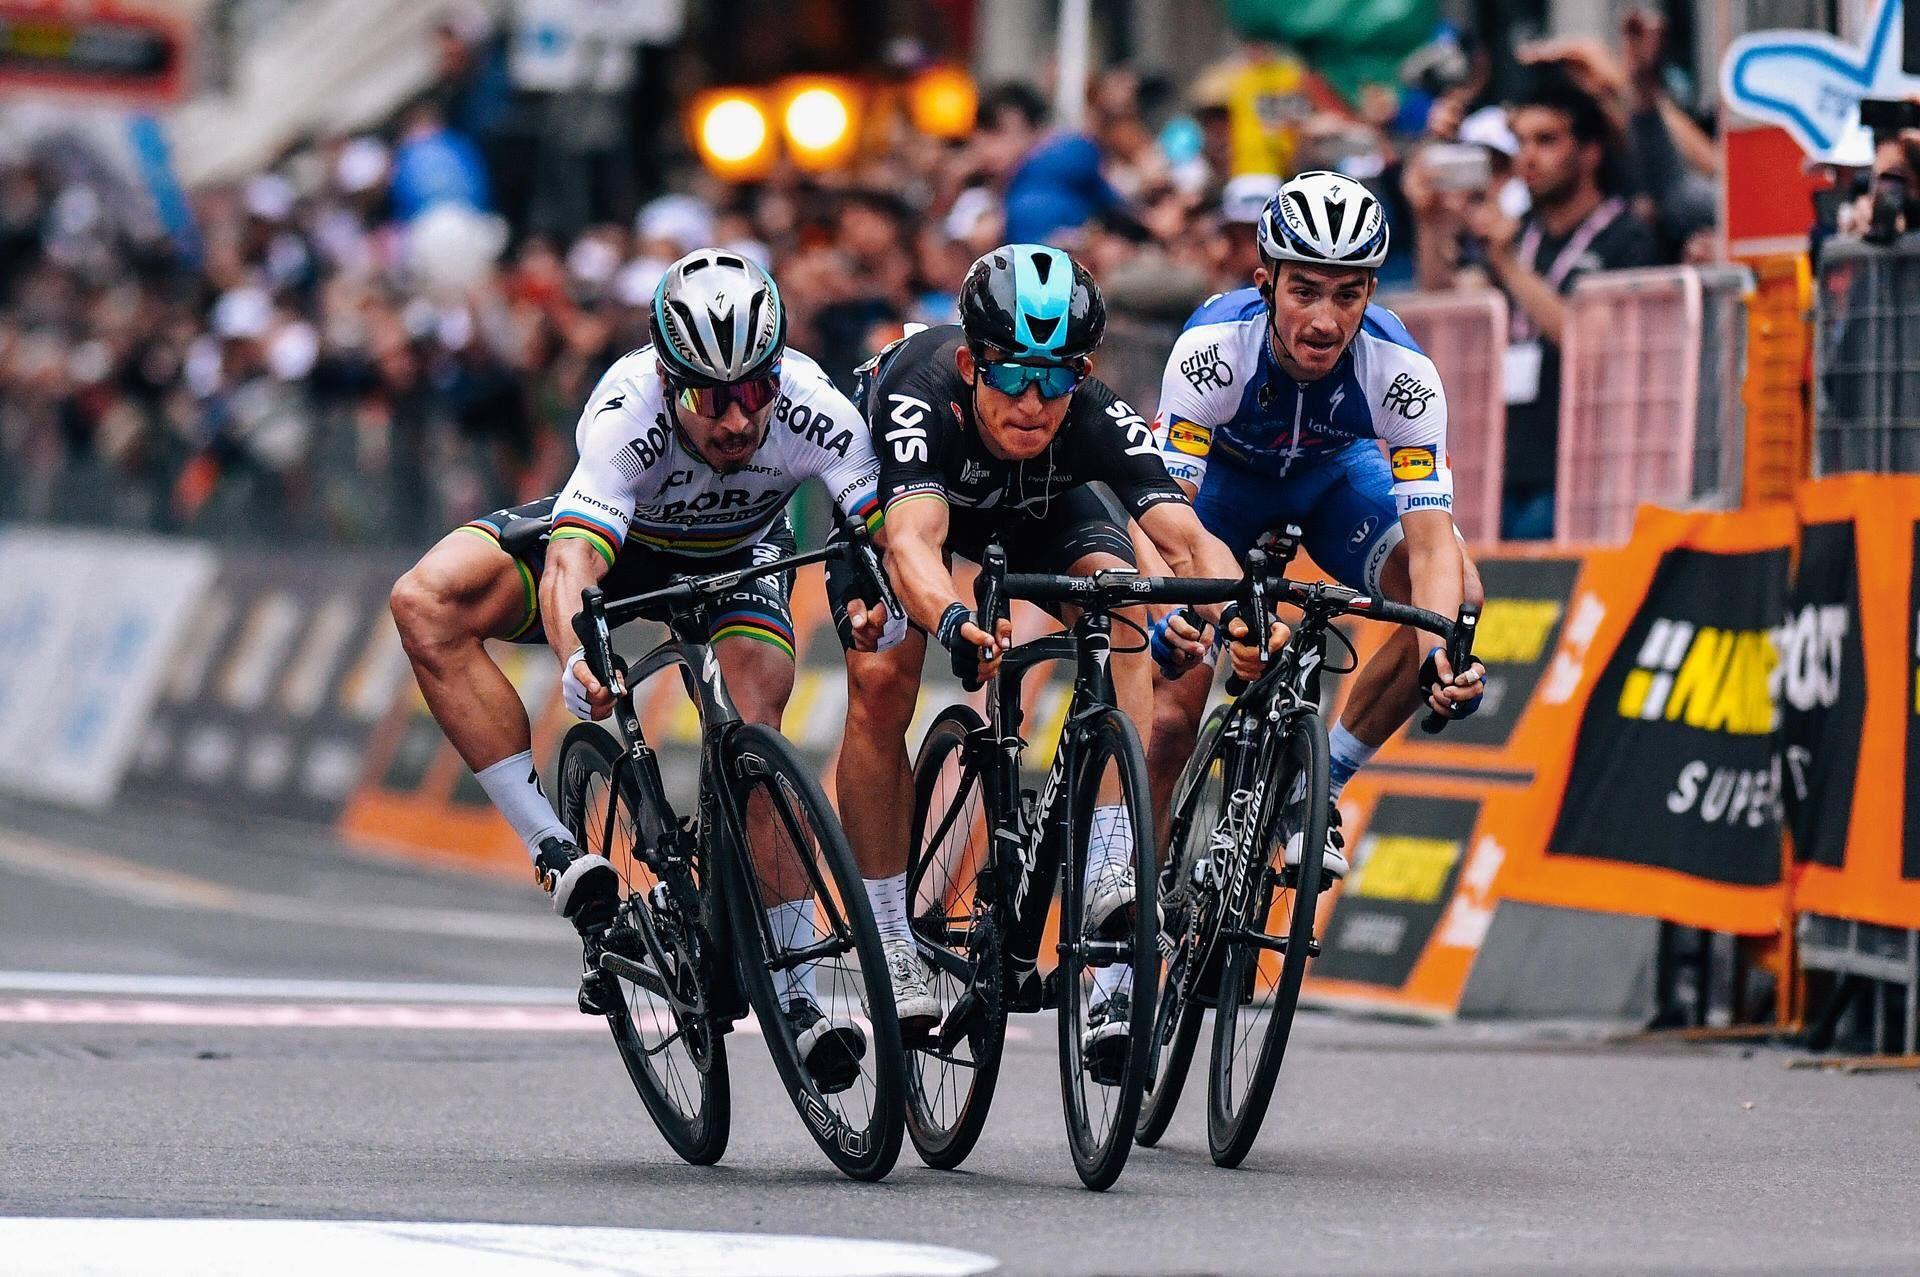 Michal Kwiatkowski And His Milan San Remo Win Cycling Race